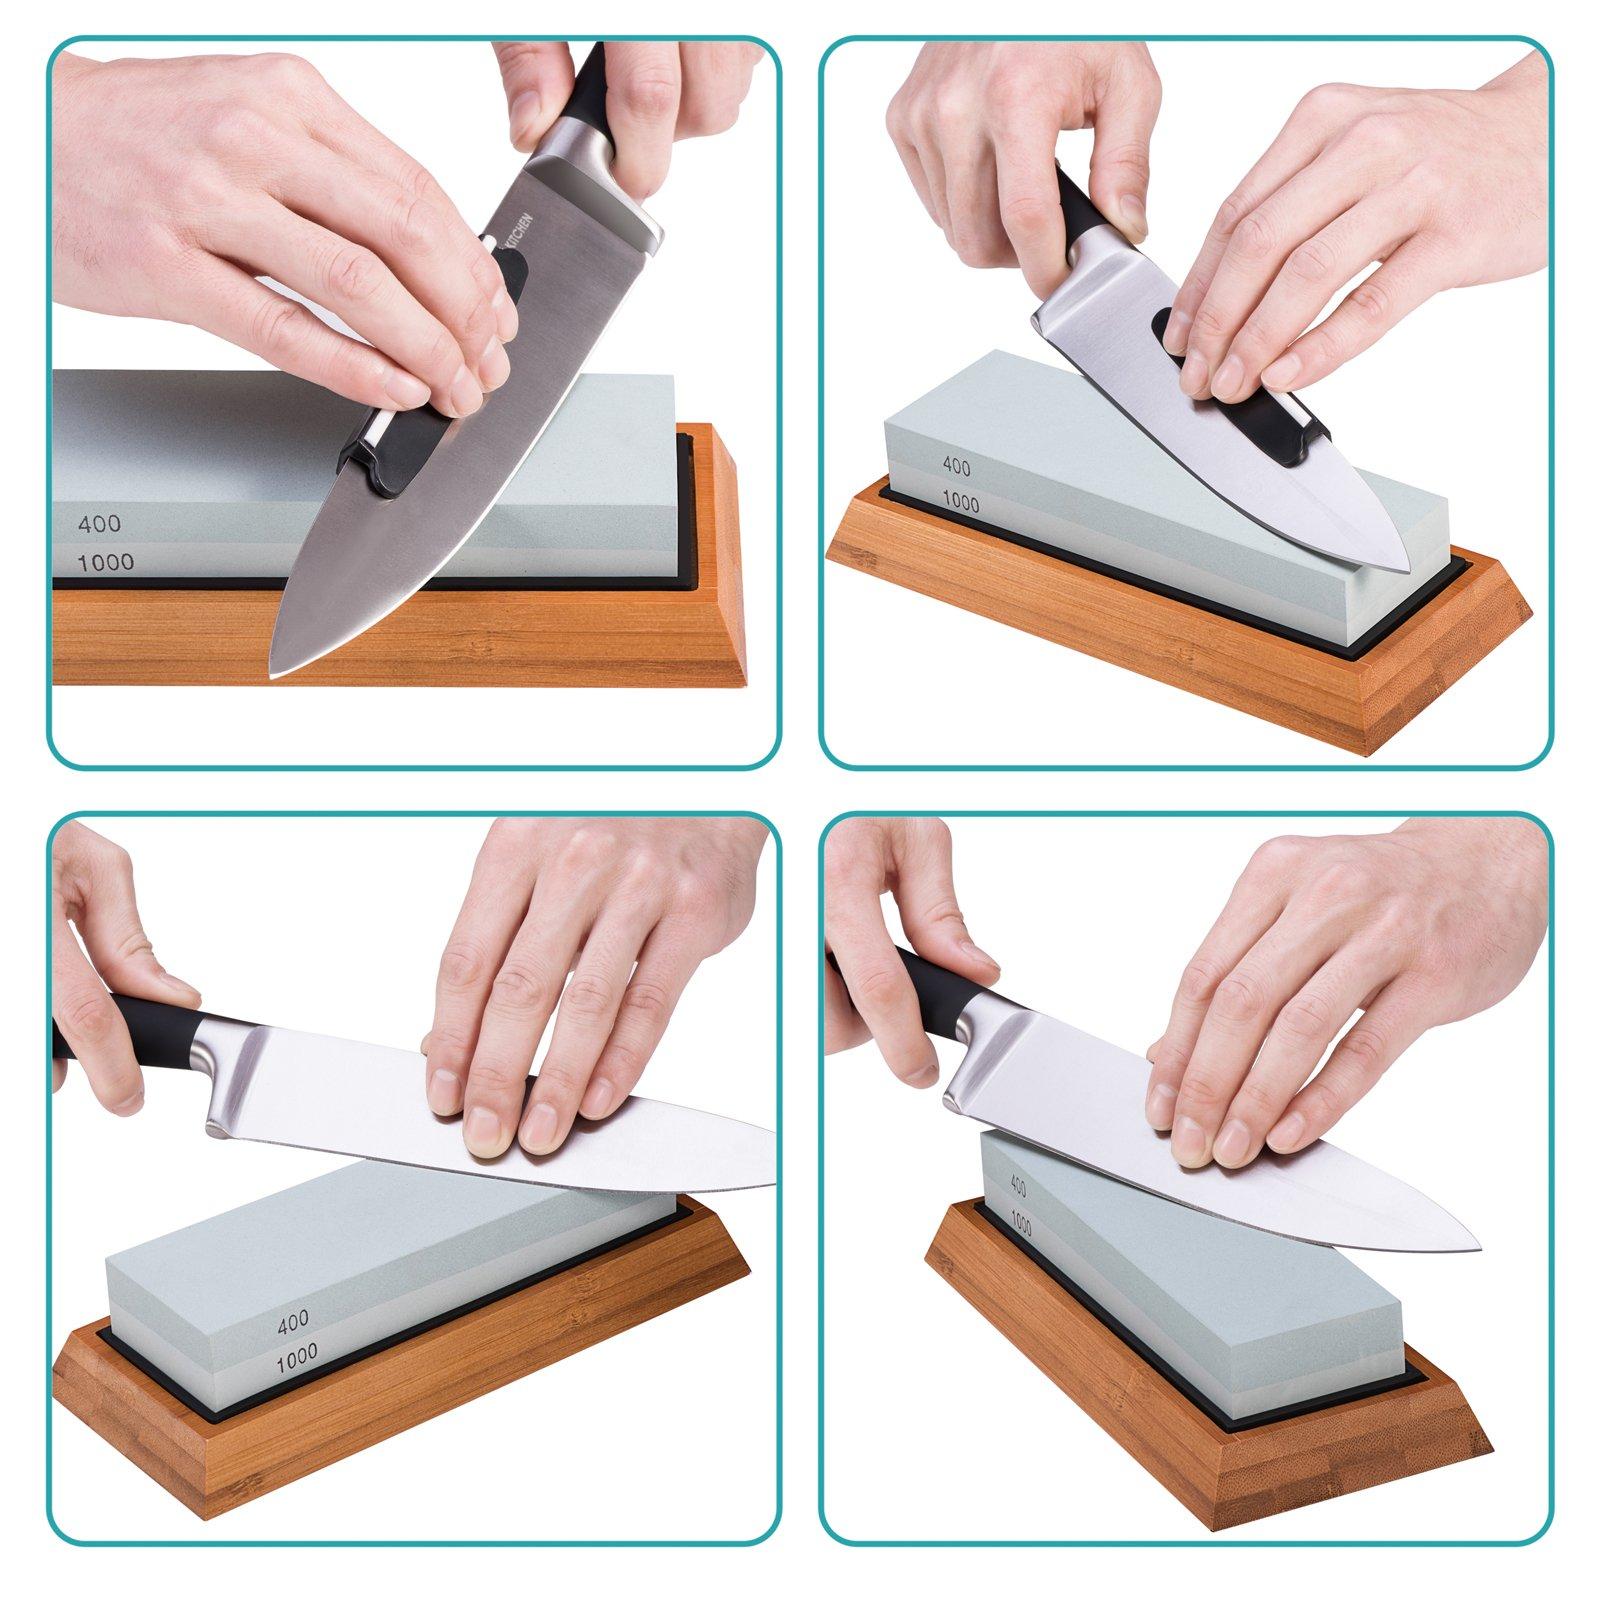 Premium Knife Sharpening Stone Kit, ASEL 4 Side 400/1000 2000/5000 Grit Whetstone, Best Kitchen Blade Sharpener Stone, Non-Slip Bamboo Base and Bonus Angle Guide Included by ASEL (Image #6)